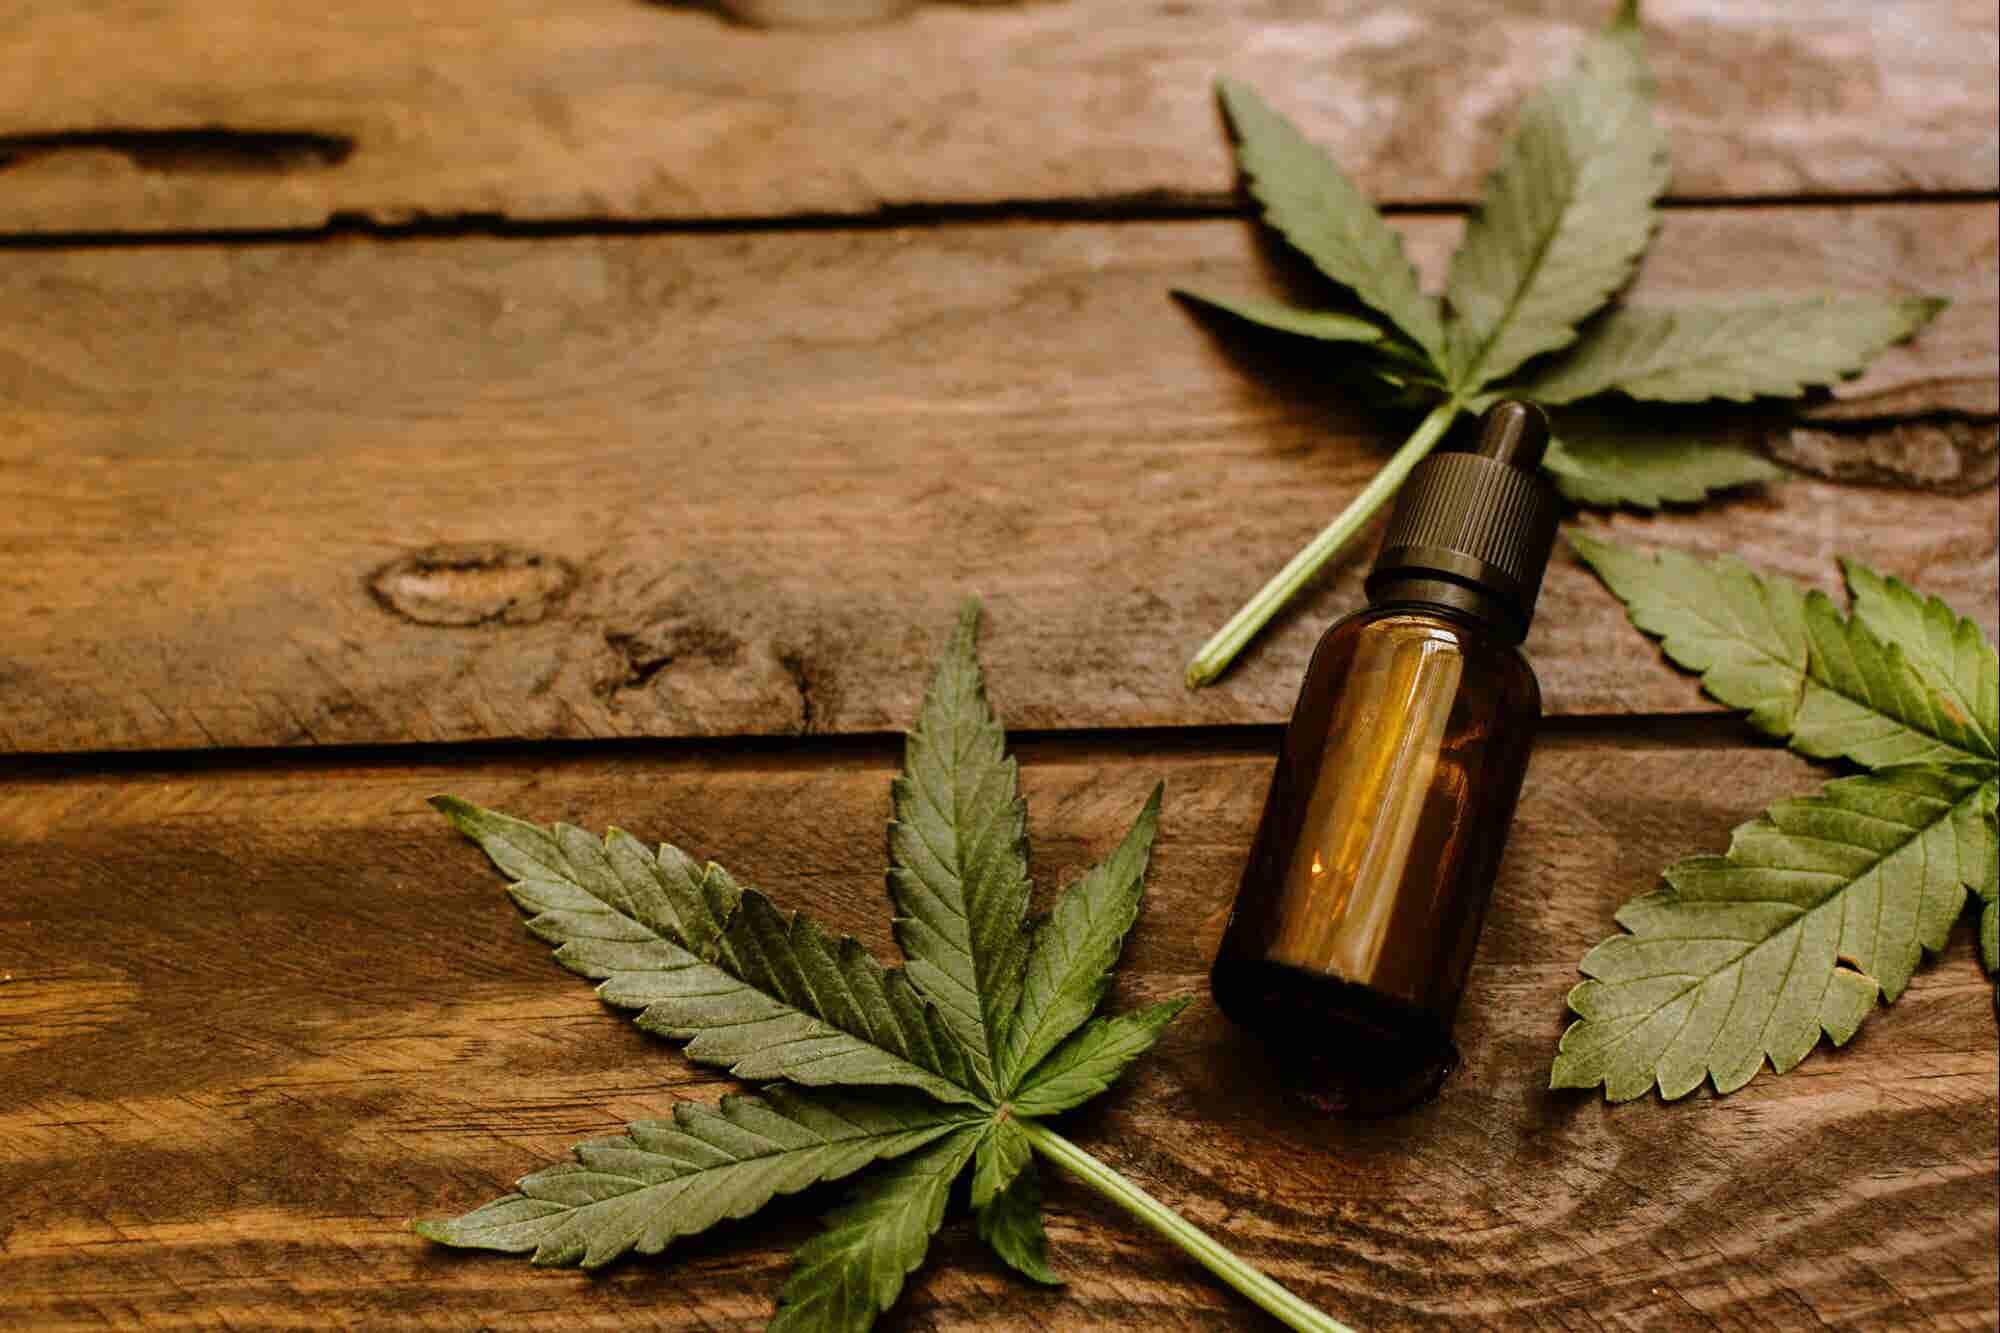 Congress Edges Closer to Legalizing Hemp